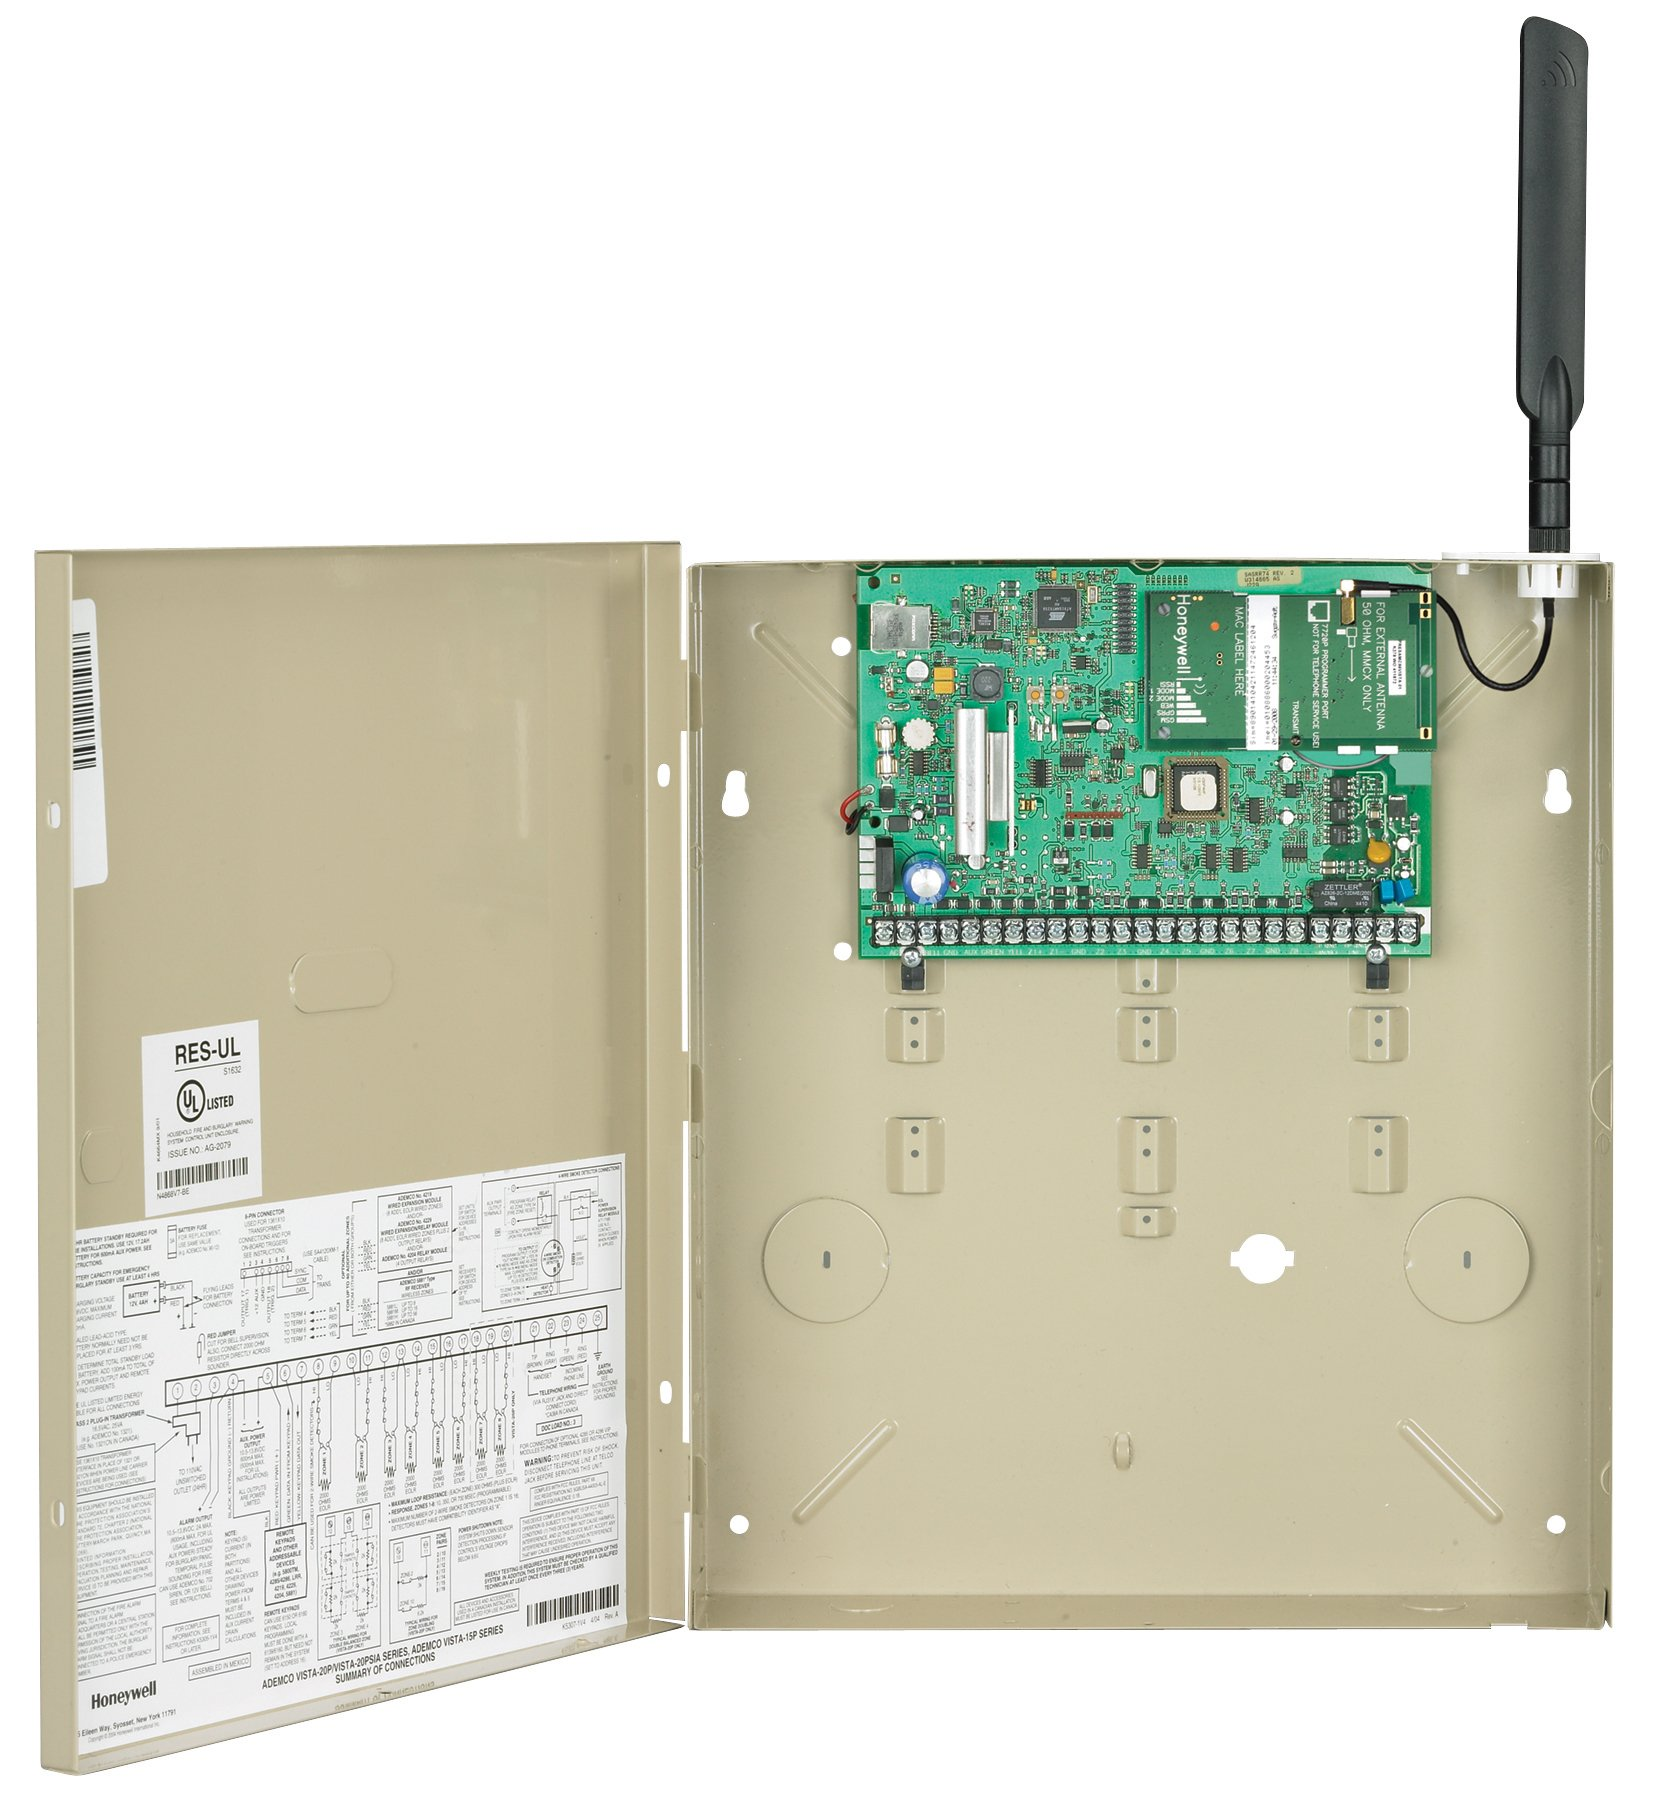 ademco vista 10p wiring diagram 1964 ford galaxie security system products birmingham al tamburello